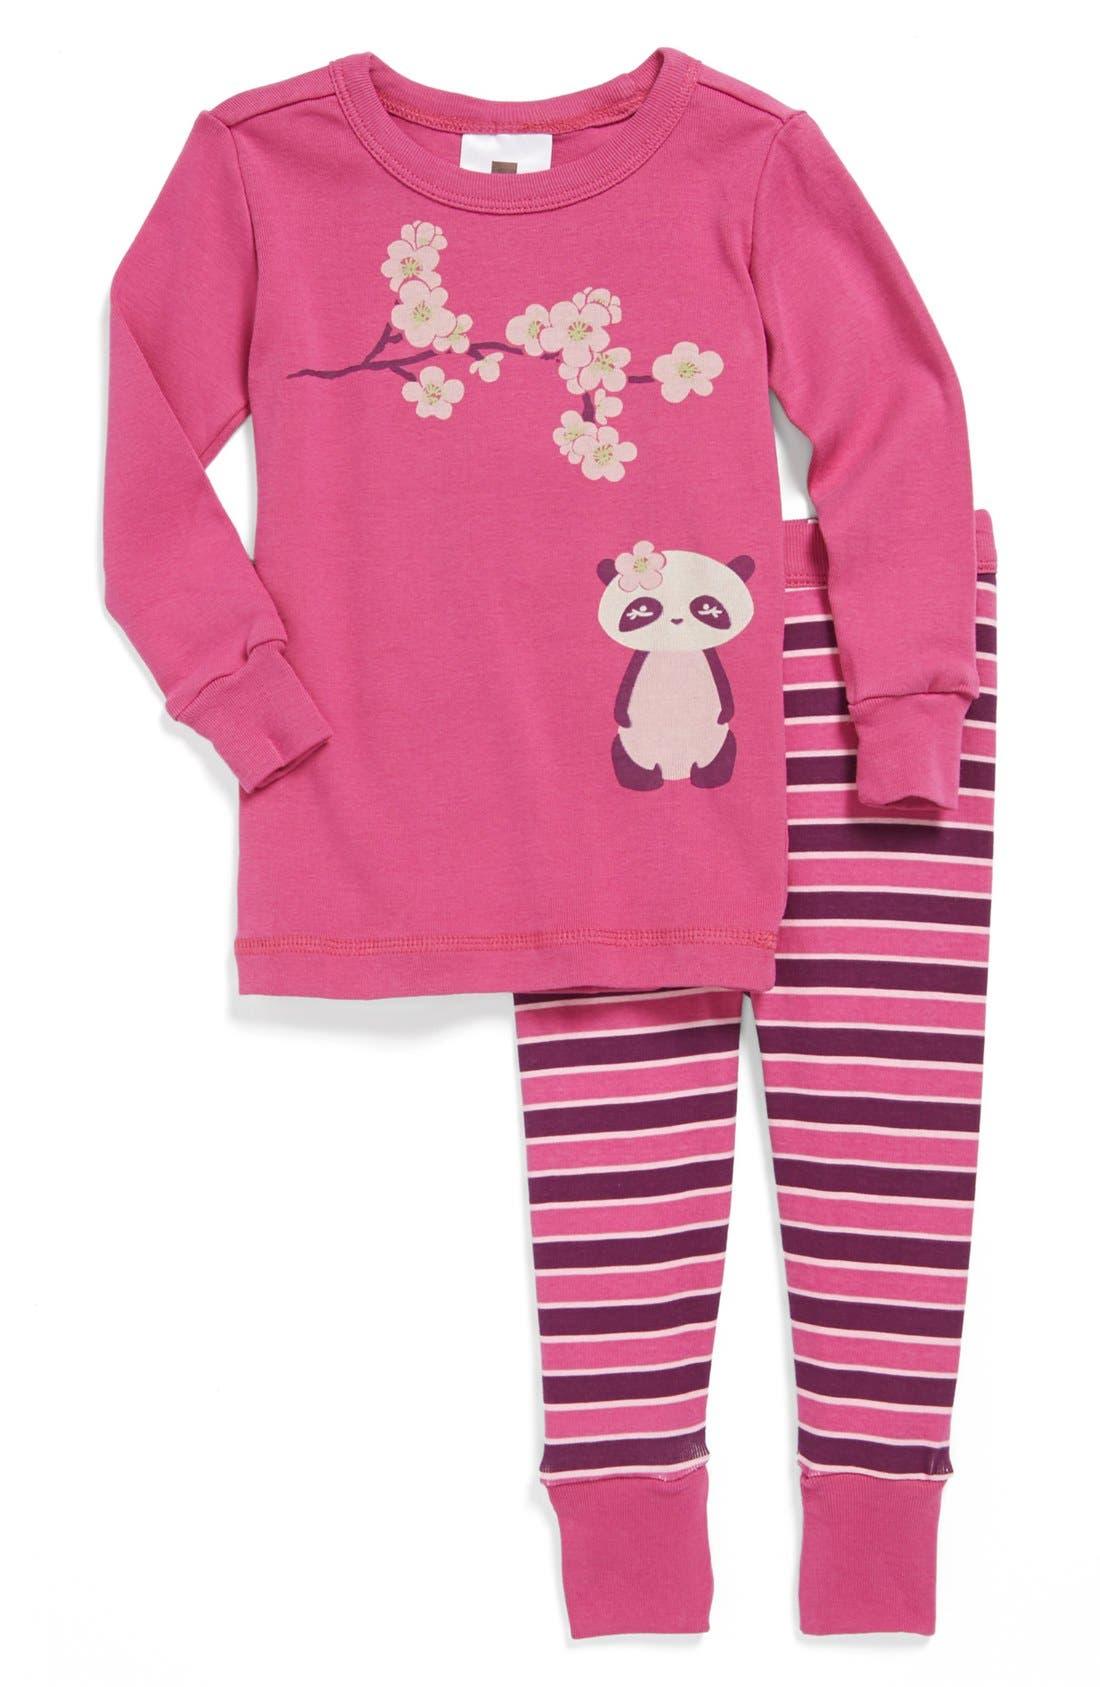 Alternate Image 1 Selected - Tea Collection 'Panda' Pajamas (Baby Girls)